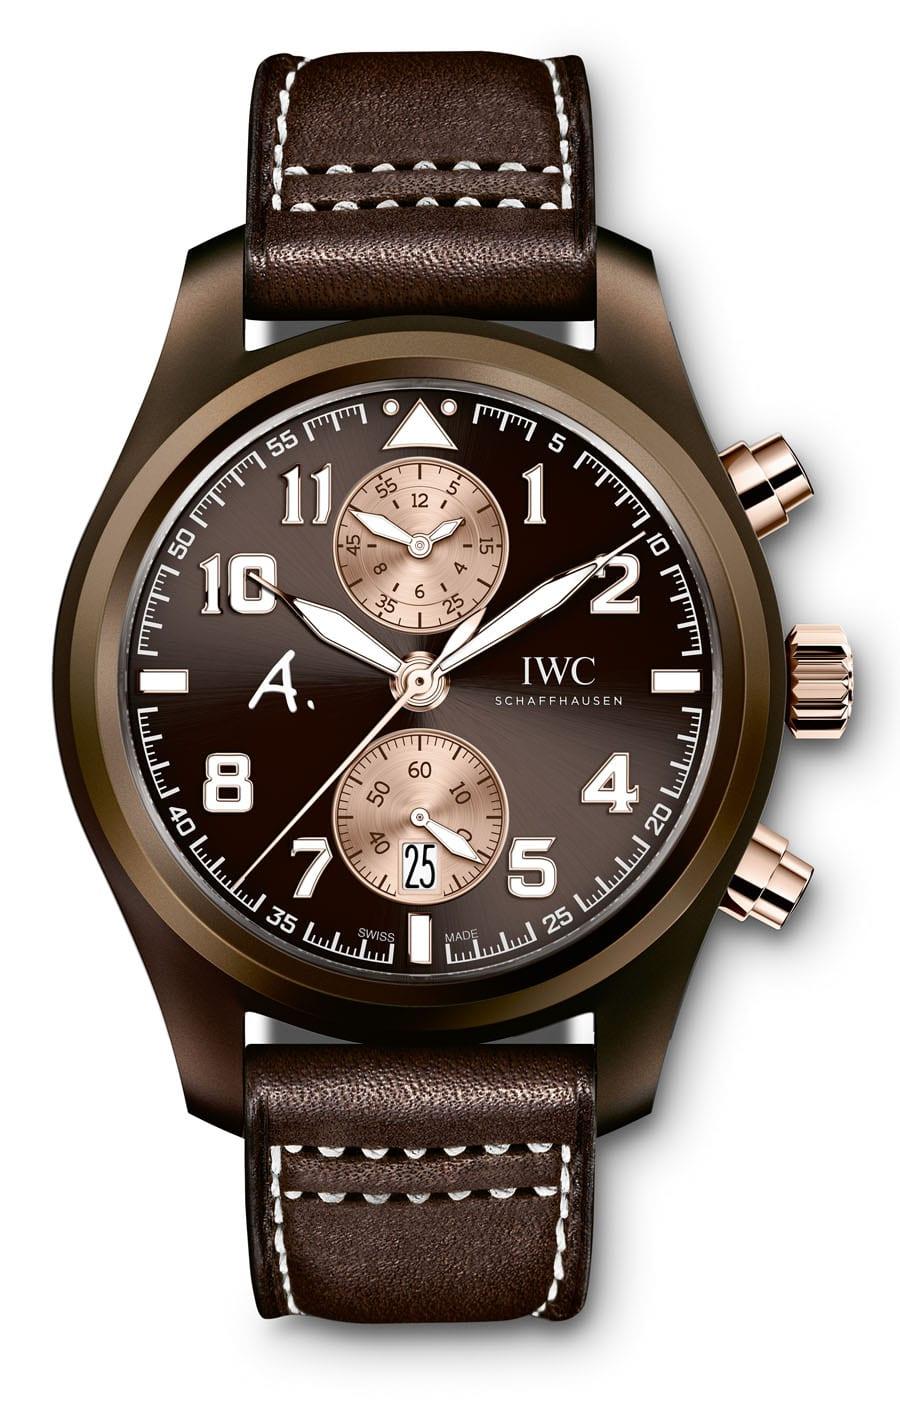 "IWC: Fliegeruhr Chronograph Edition ""The Last Flight"" Rotgoldvariante"